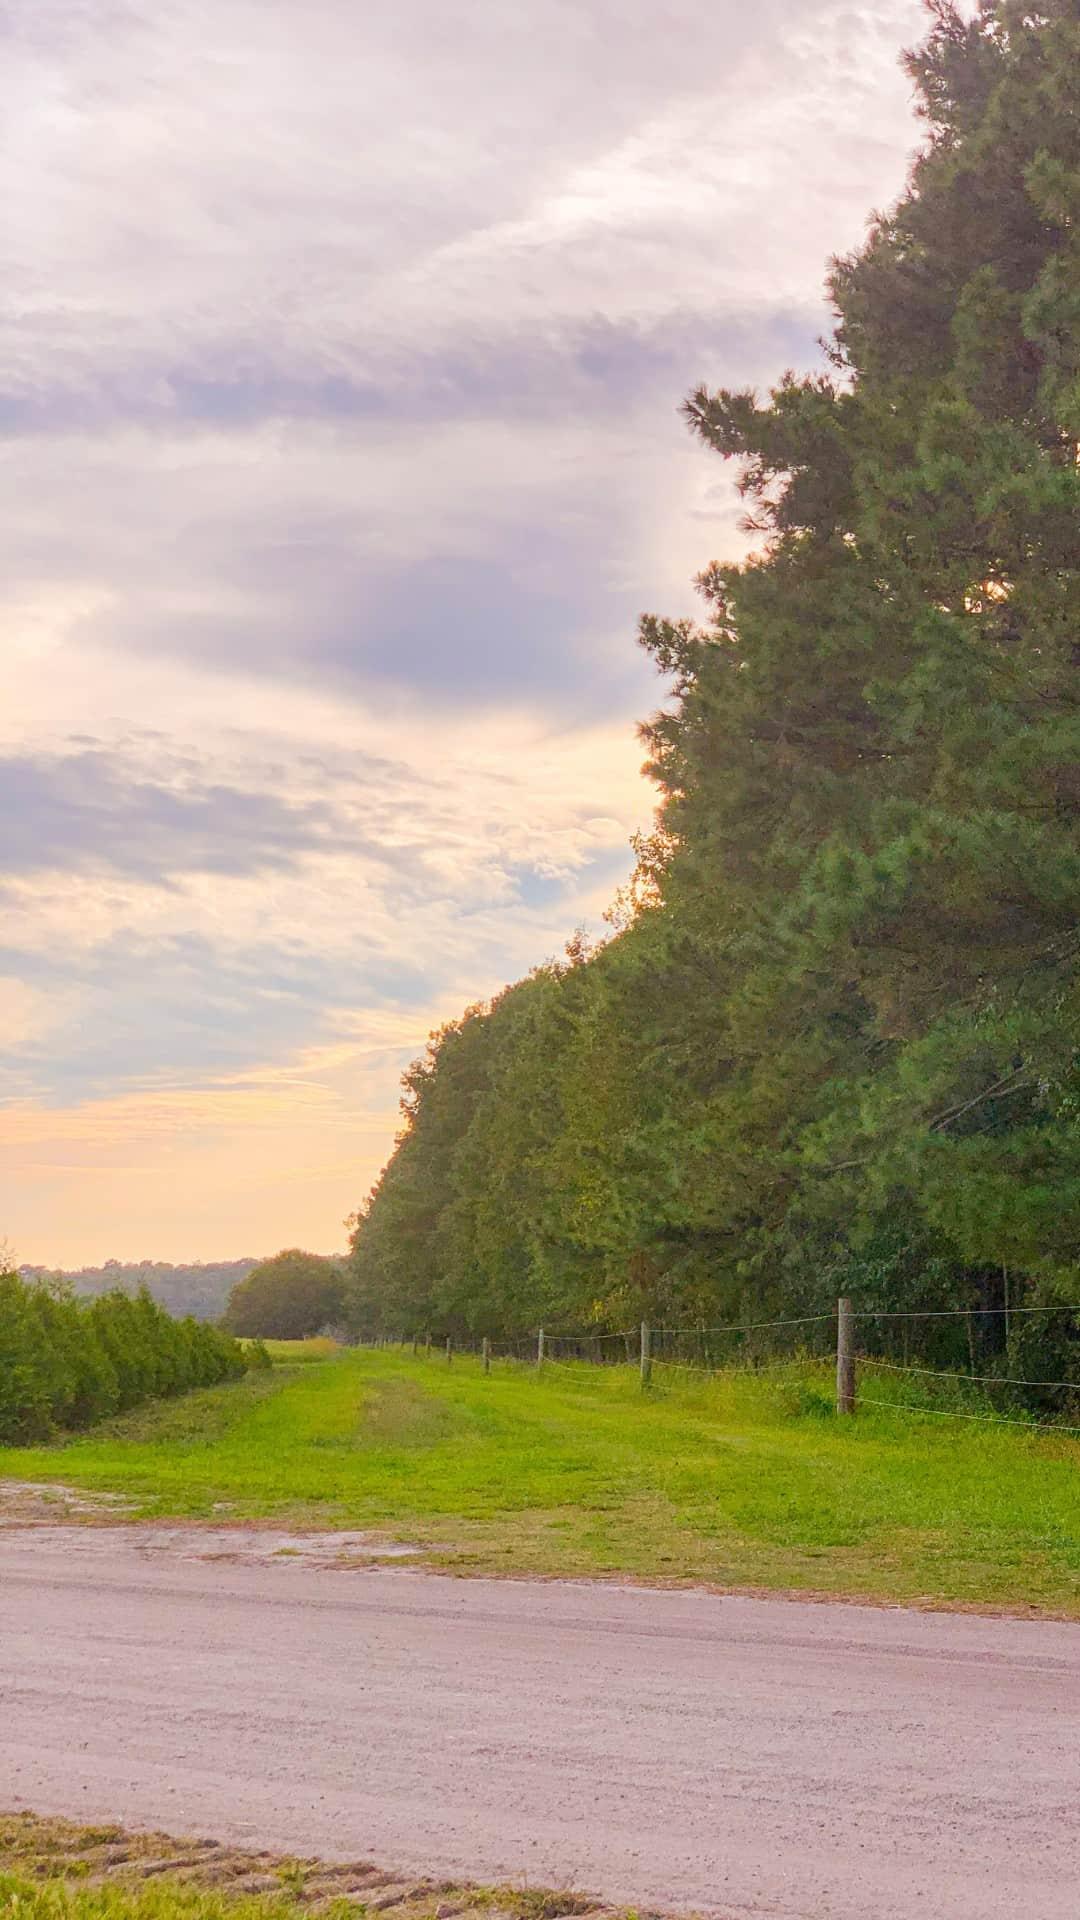 Fall iPhone Wallpaper Aesthetic Farm Roads